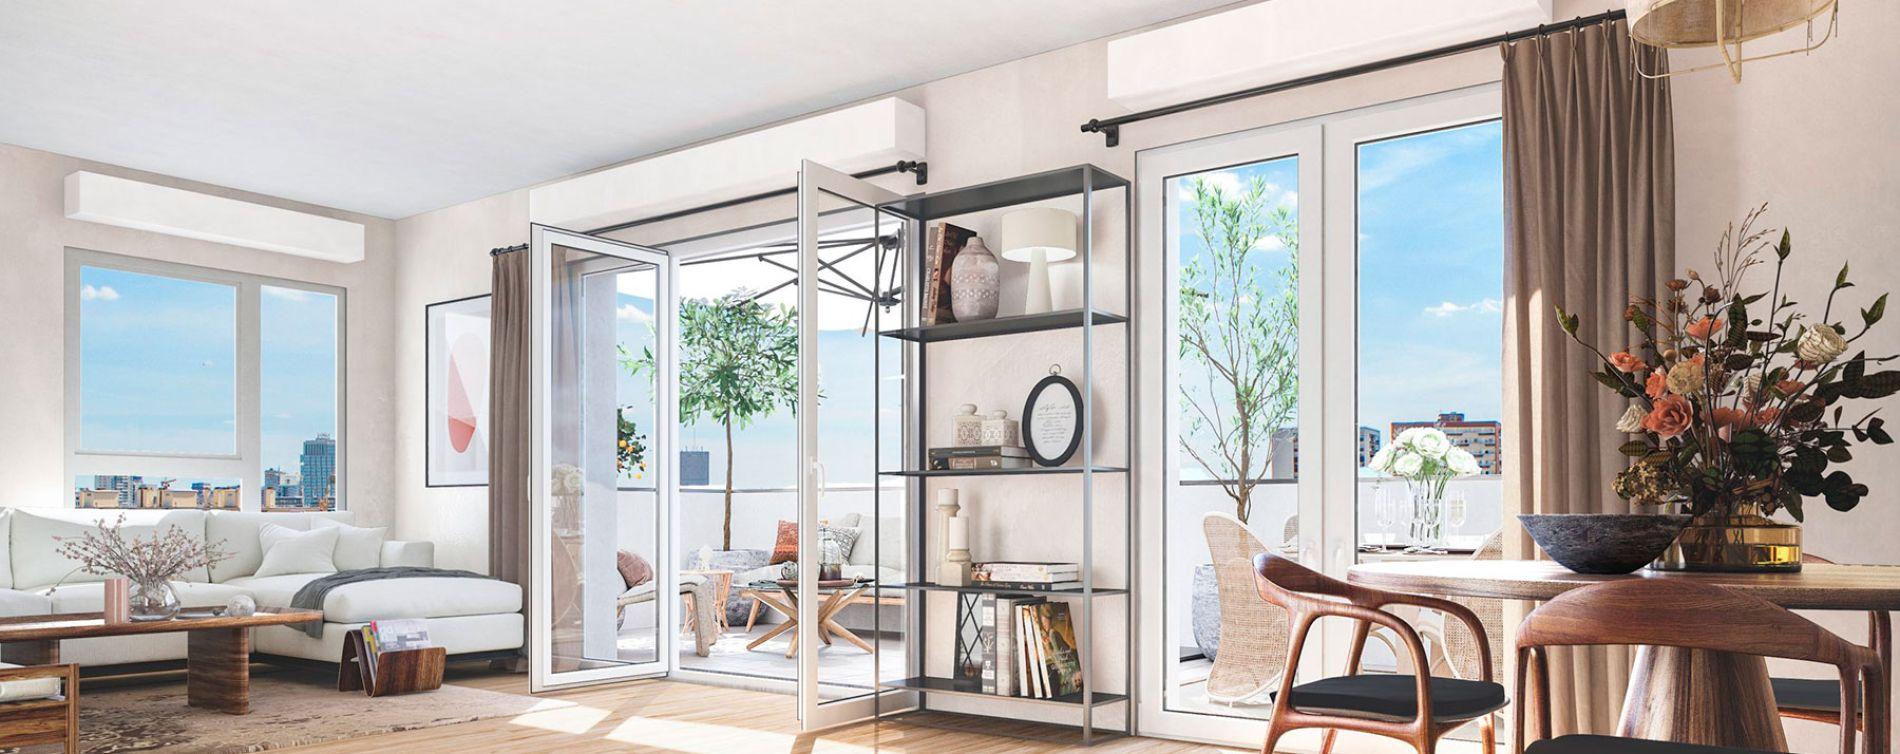 Clichy : programme immobilier neuve « Rose Guérin »